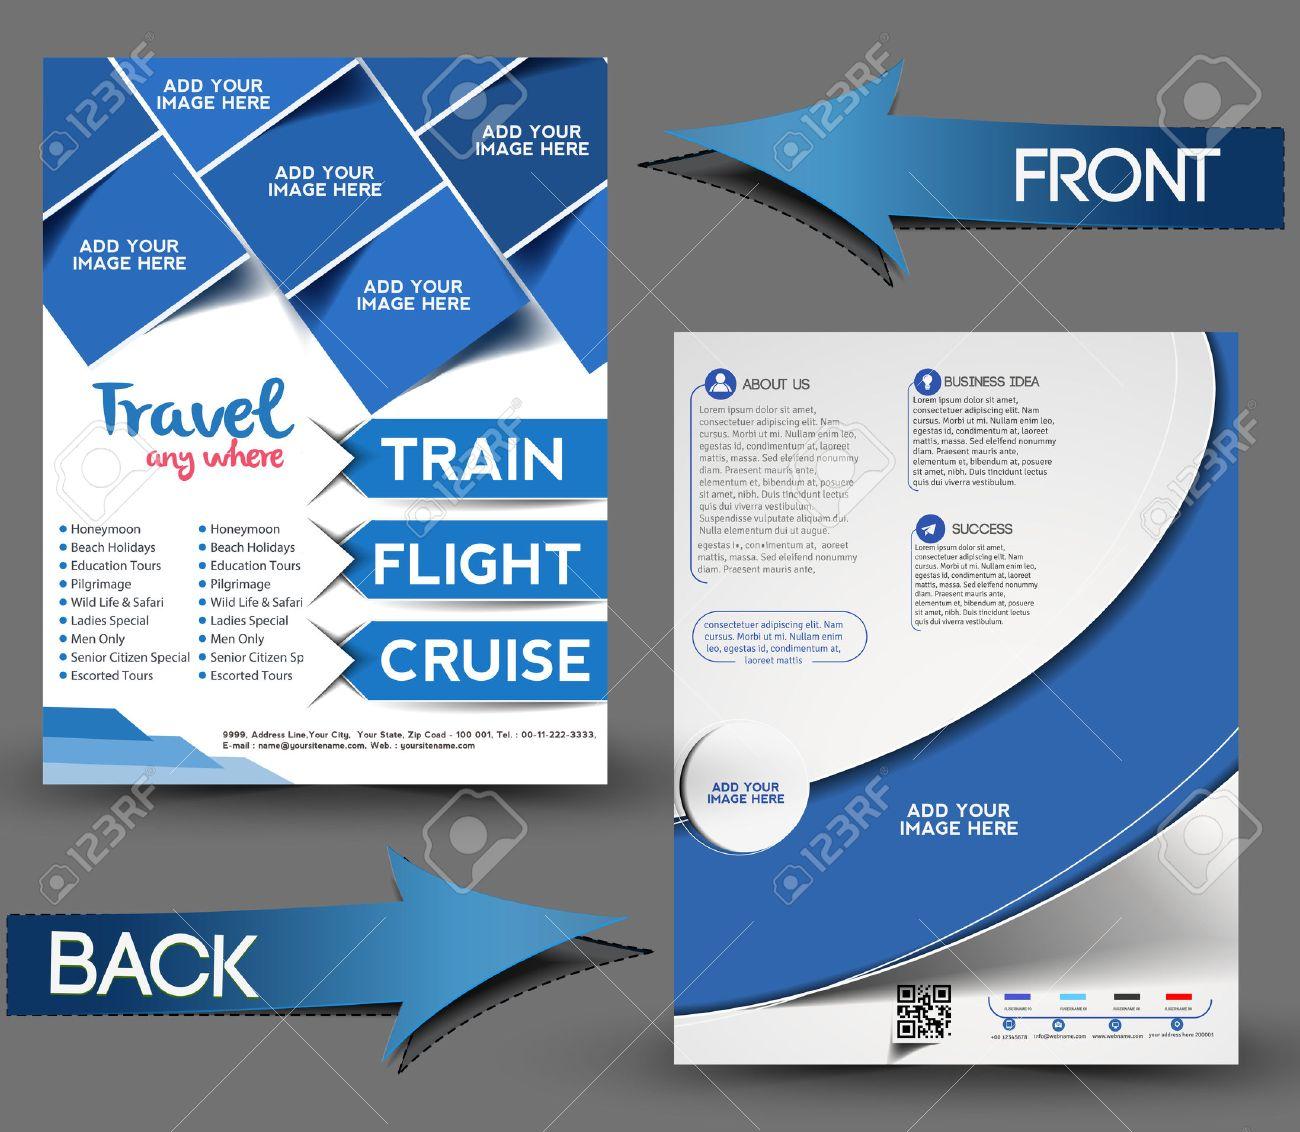 travel center front back flyer template royalty cliparts travel center front back flyer template stock vector 28394250